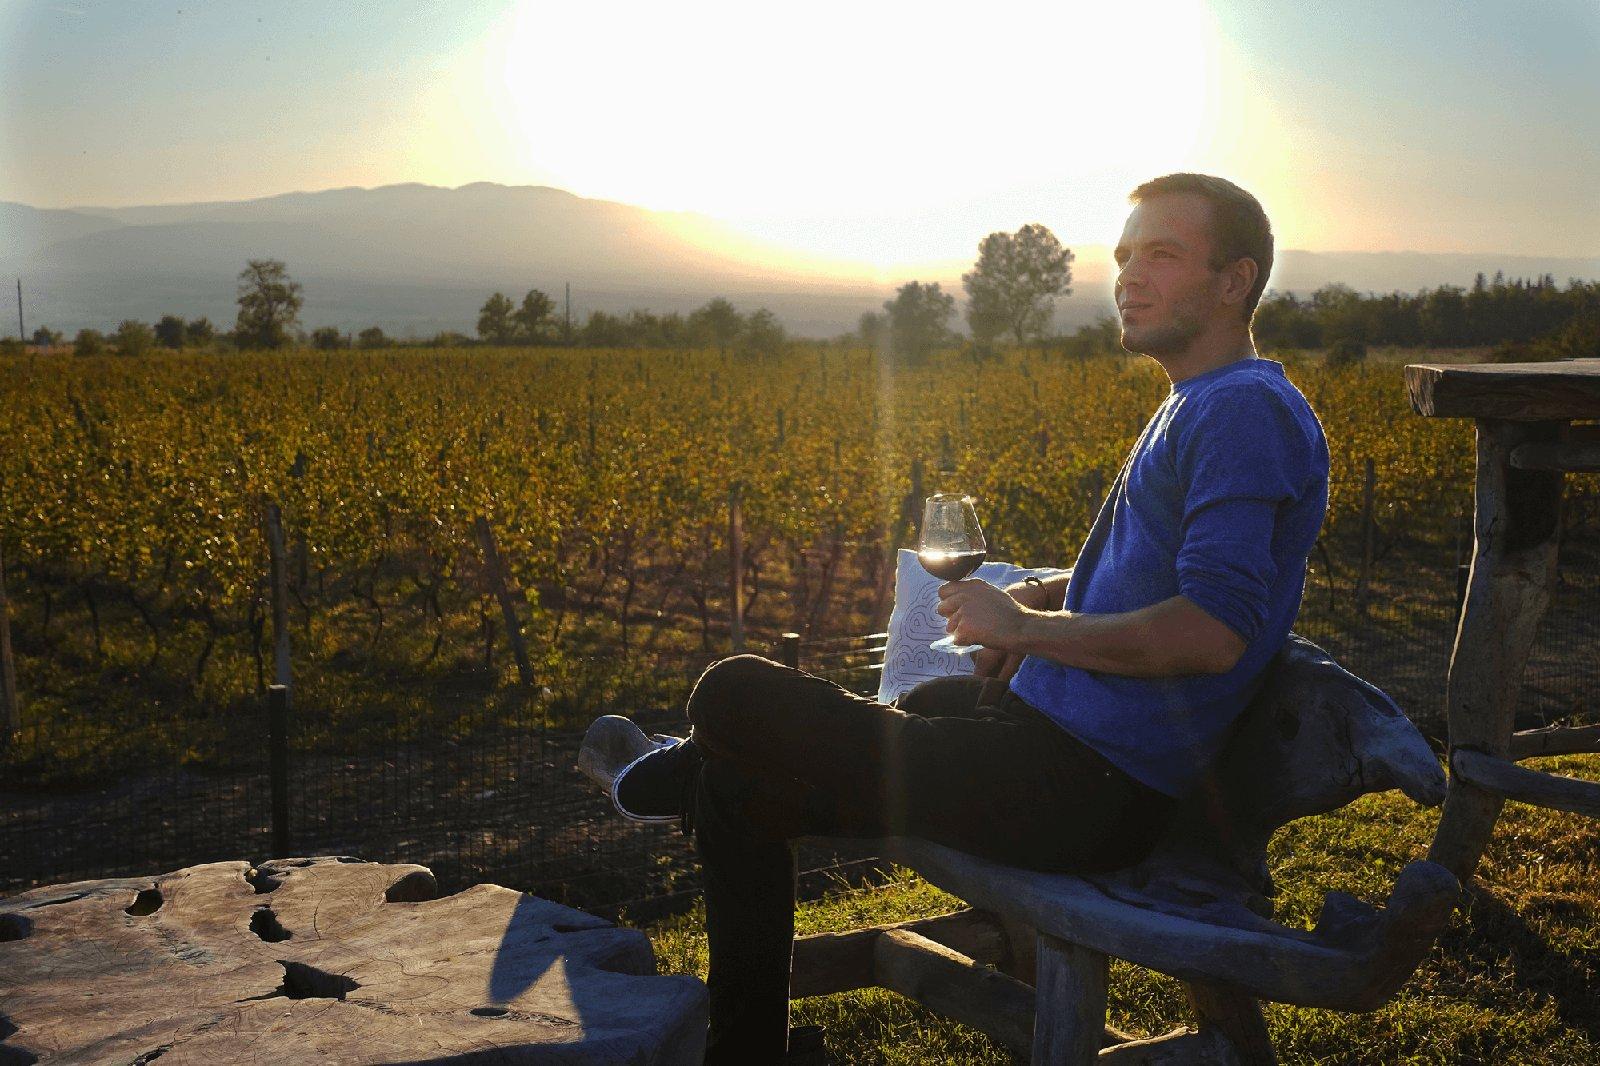 Bild: Sergio in Georgiens Weinregion Kakheti